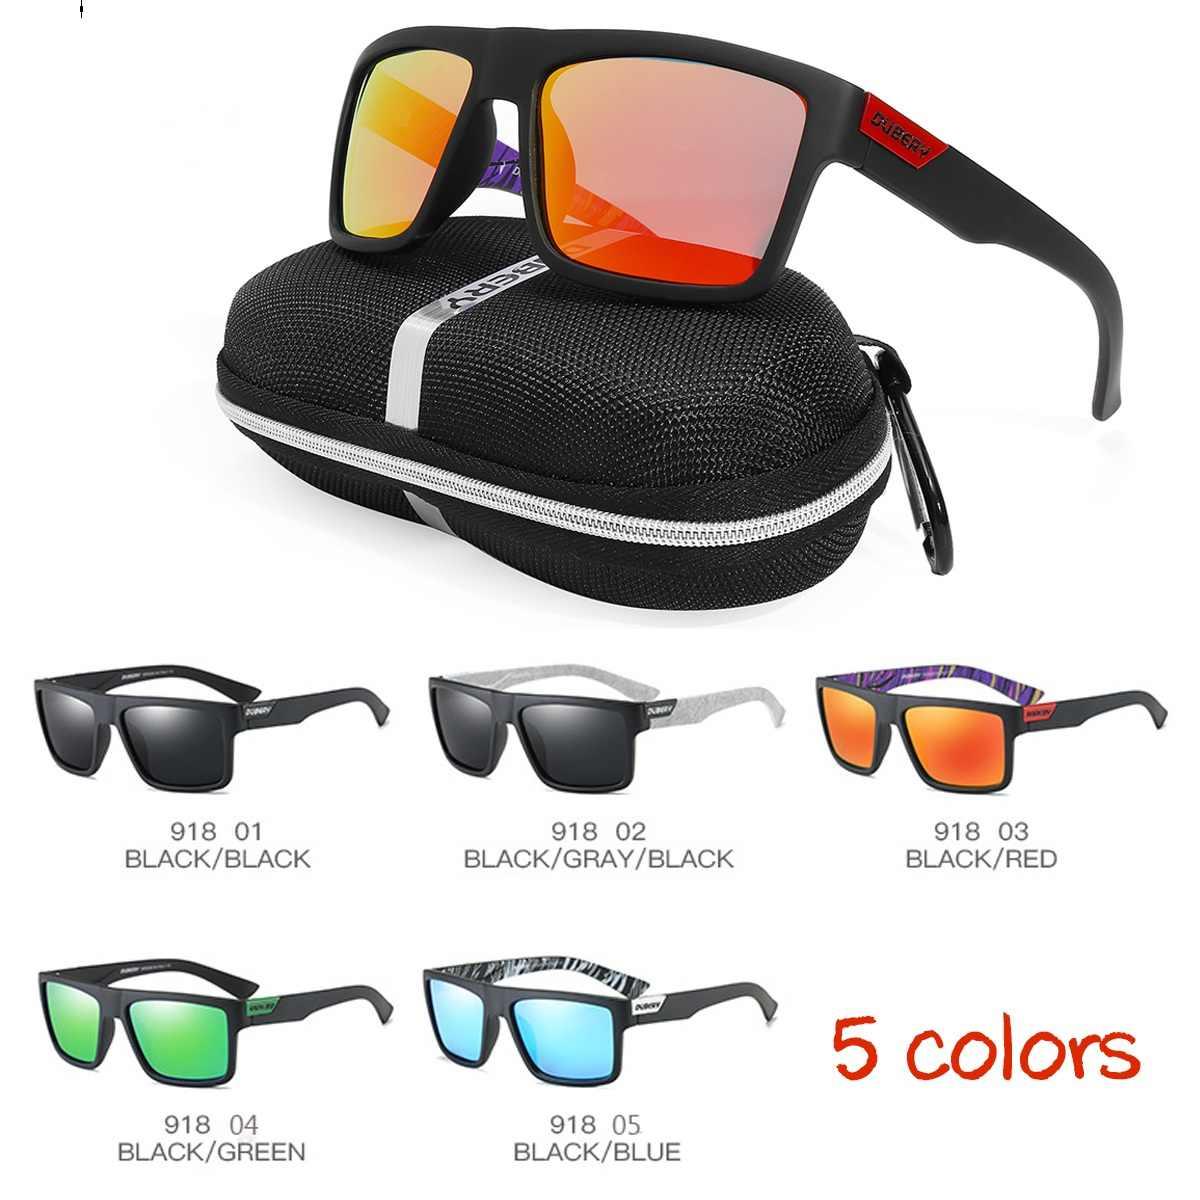 c92fc84a16e Polarized Sunglasses Men Women Sports Eyewear UV400 Fishing Cycling Goggle  Anti-Glare Driving Traveling Sun